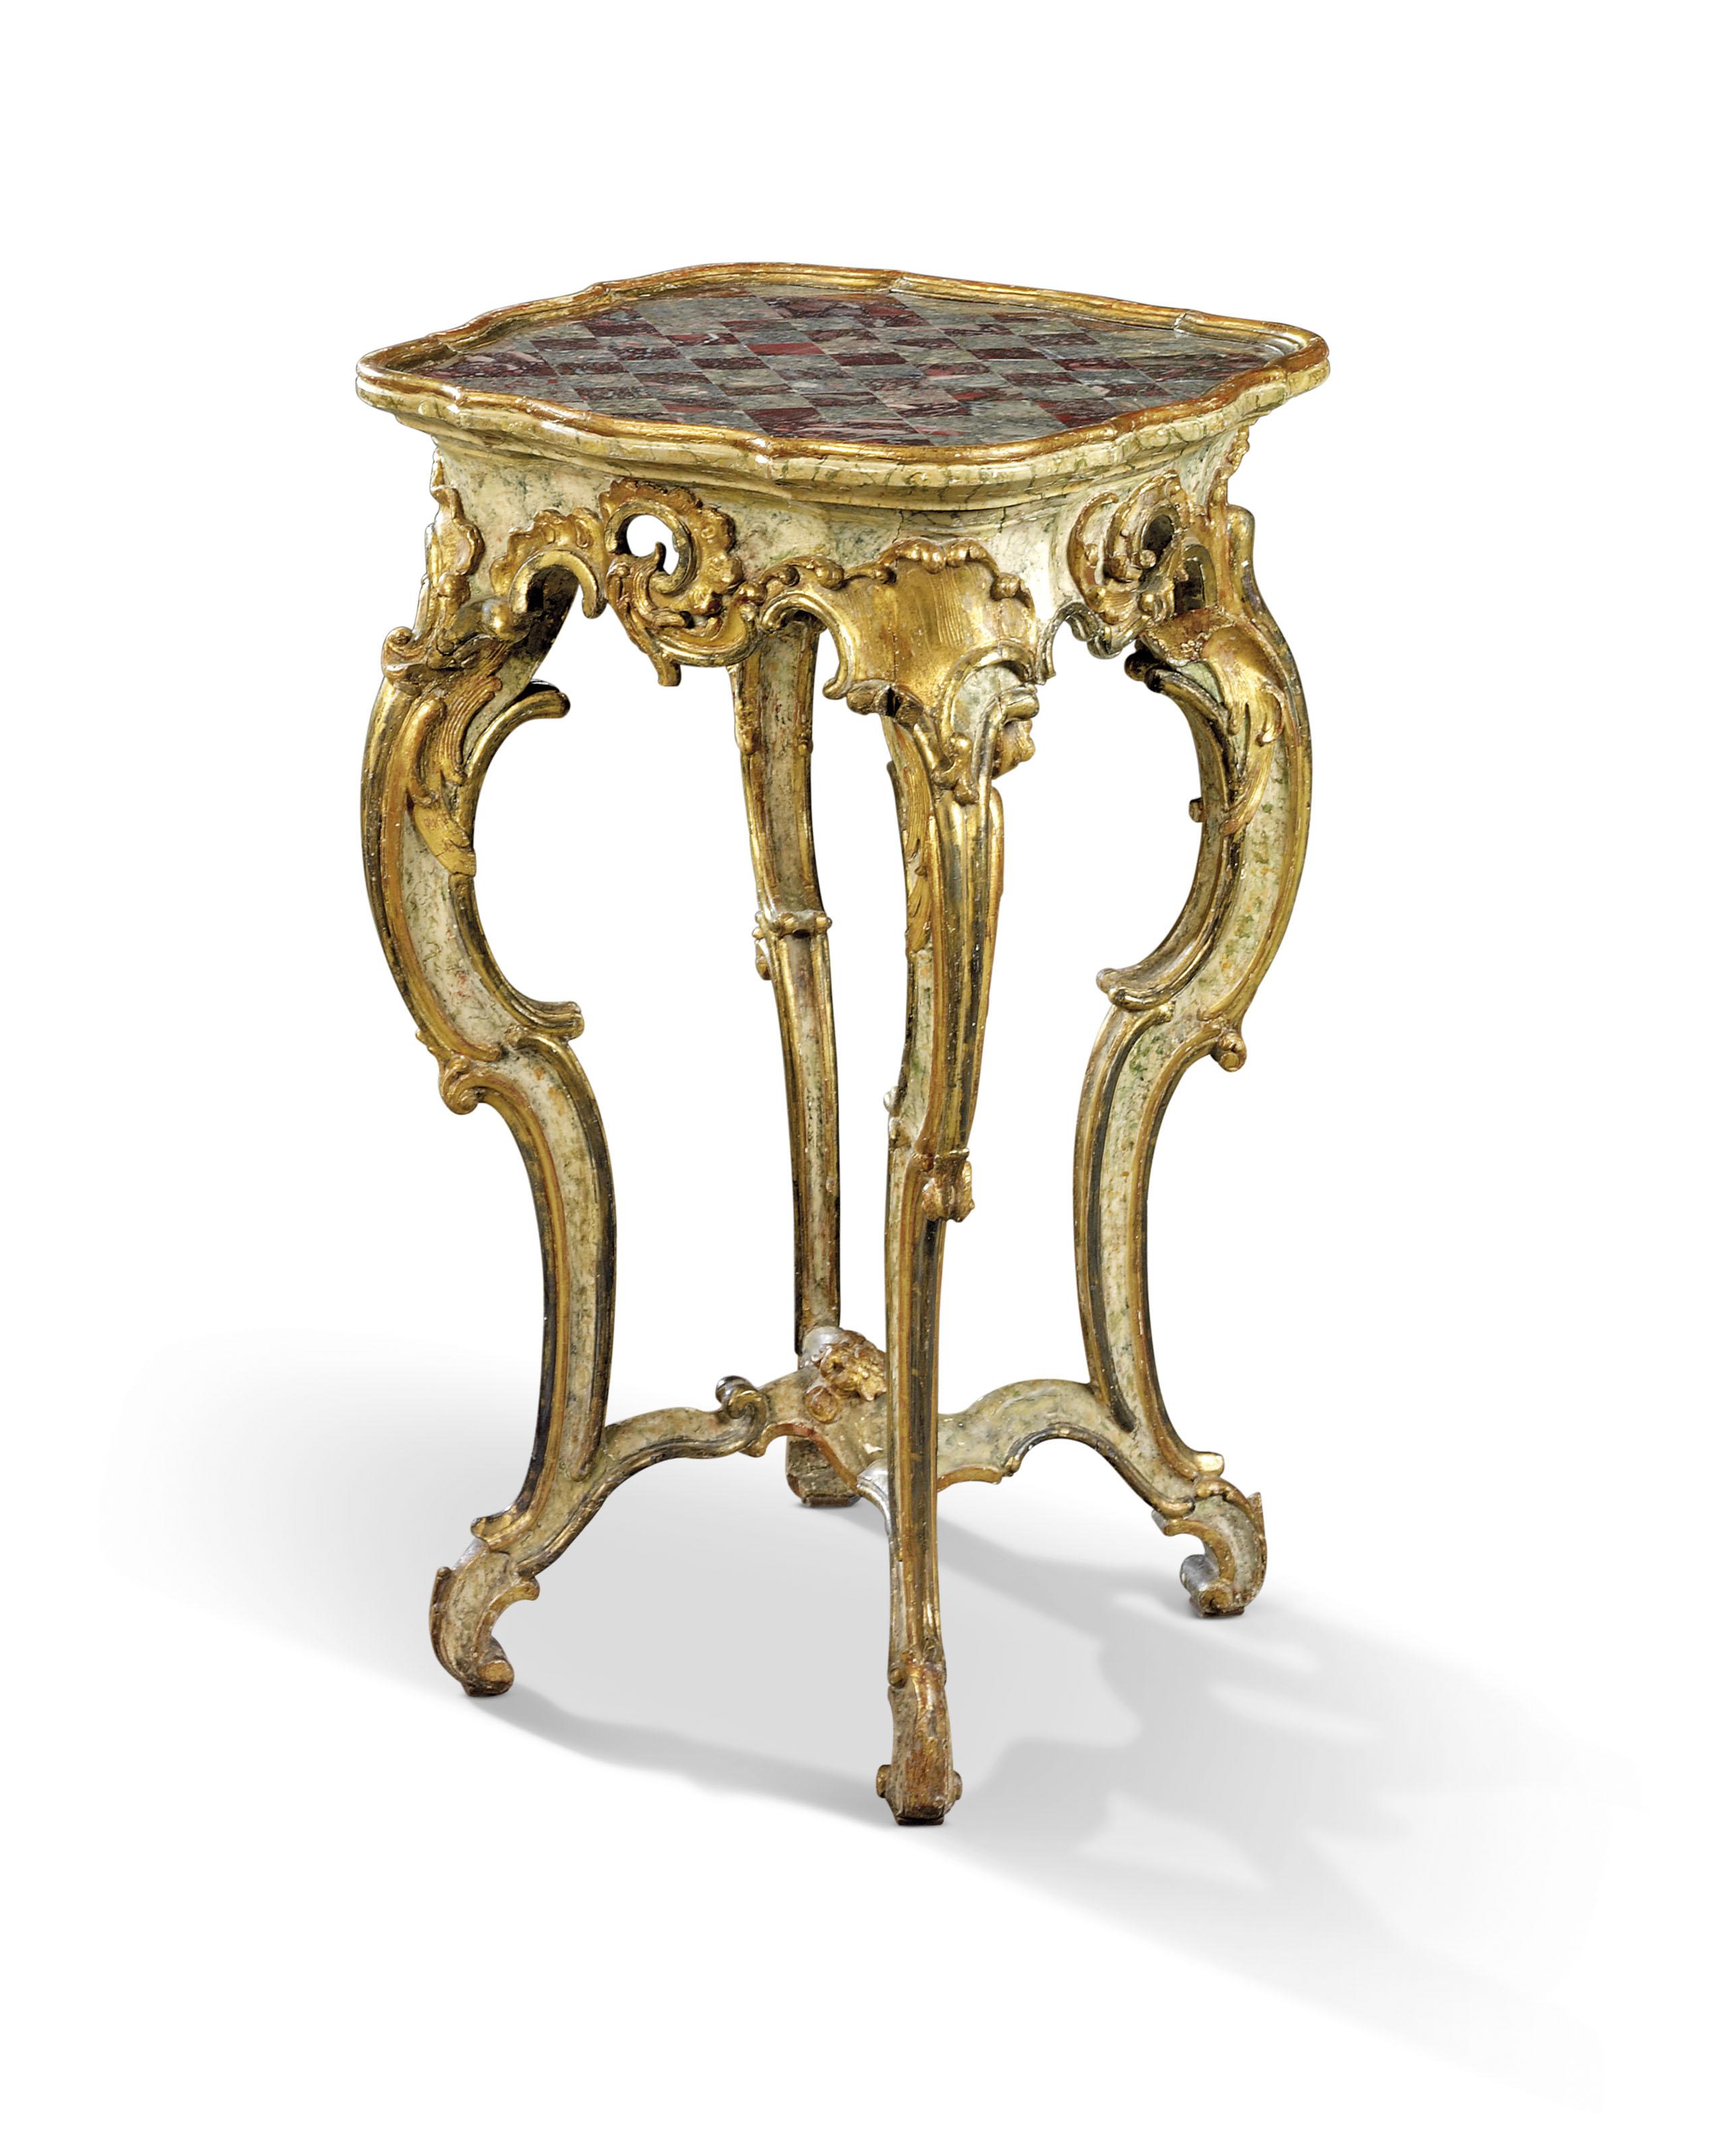 Earnest Antique Mahogany X Cross Legs Foot Stool Wood Lustrous Surface Furniture